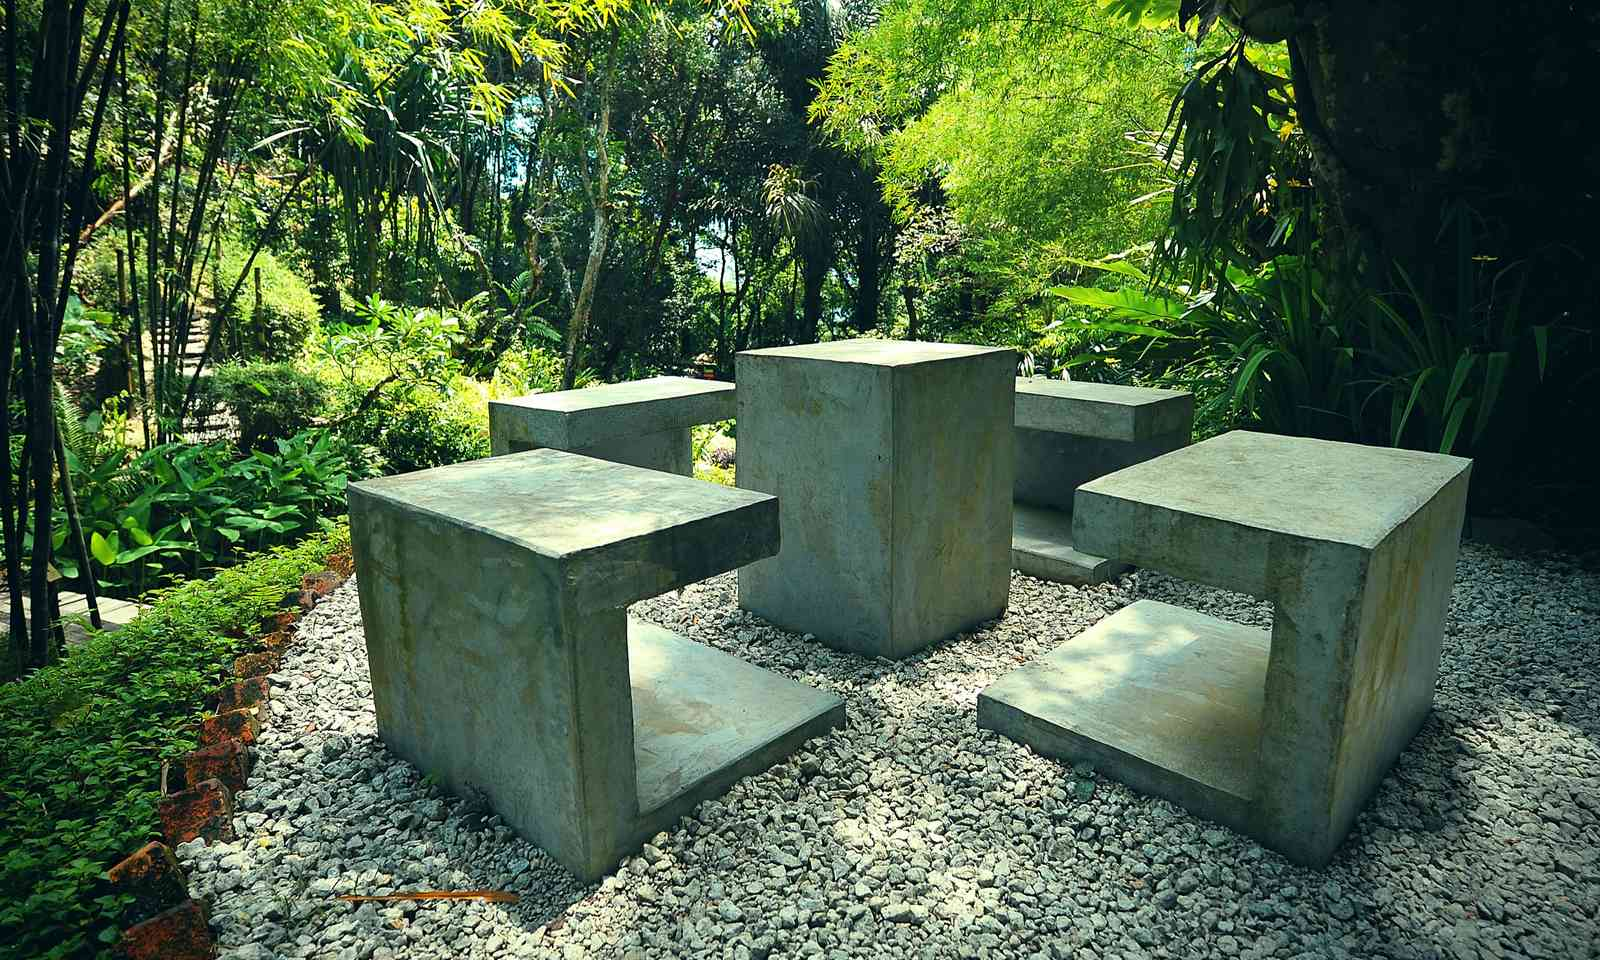 A hidden corner in the Tropical Spice Garden (Dreamstime)